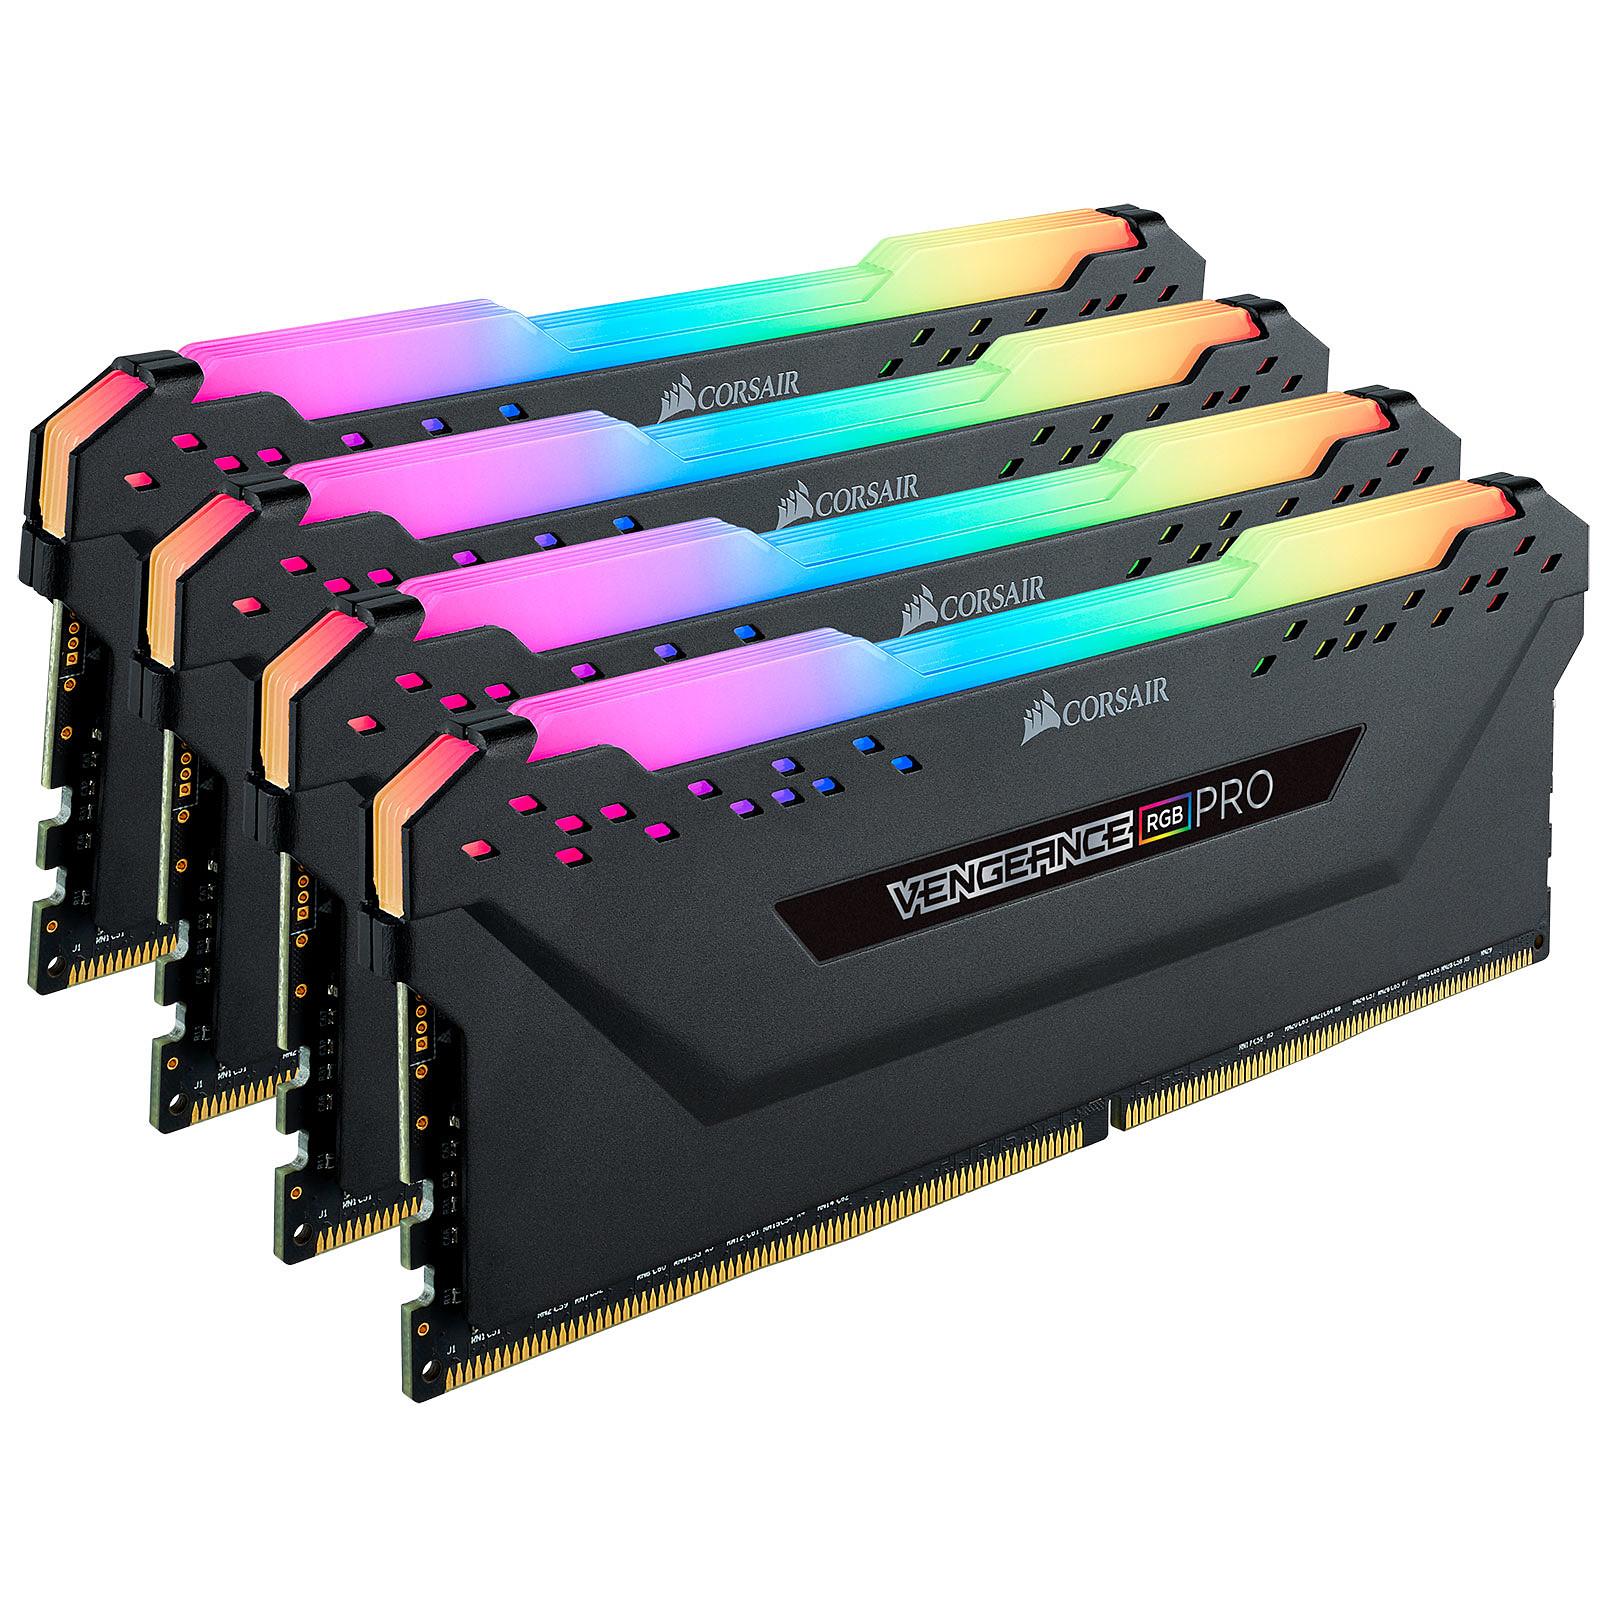 Corsair Vengeance RGB PRO Series 32 GB (4x 8 GB) DDR4 3200 MHz CL16